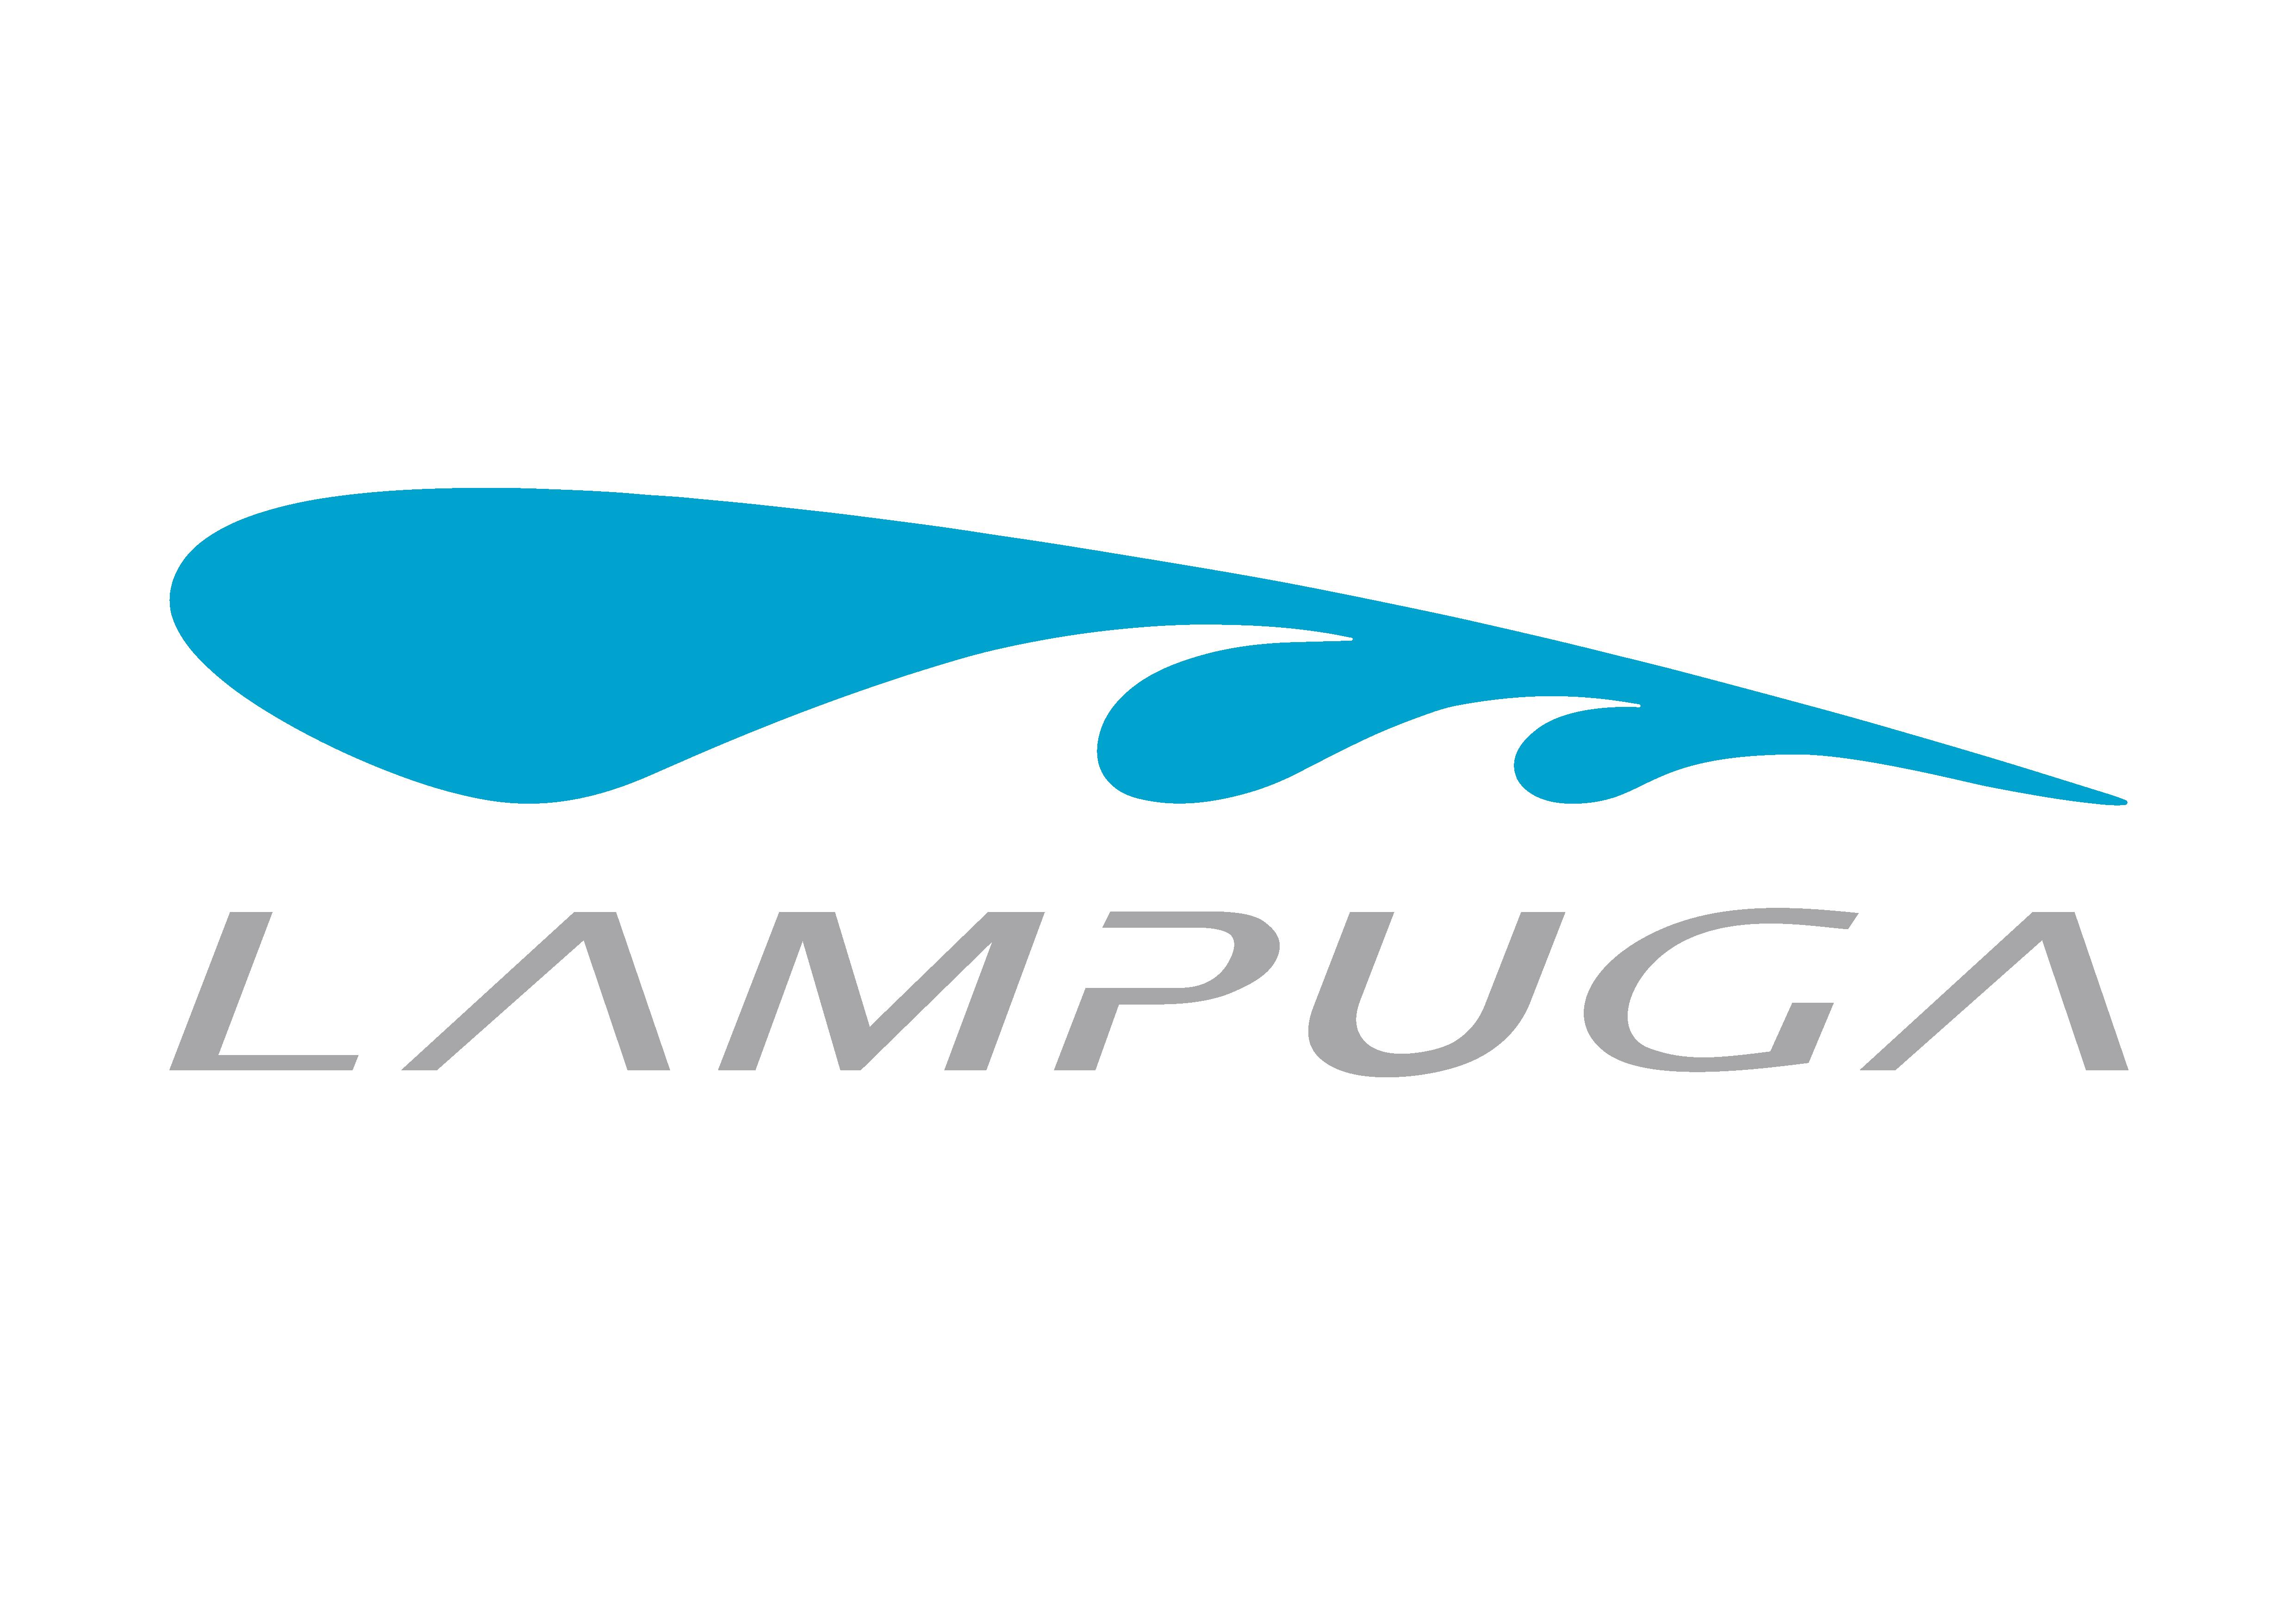 LAMPUGA